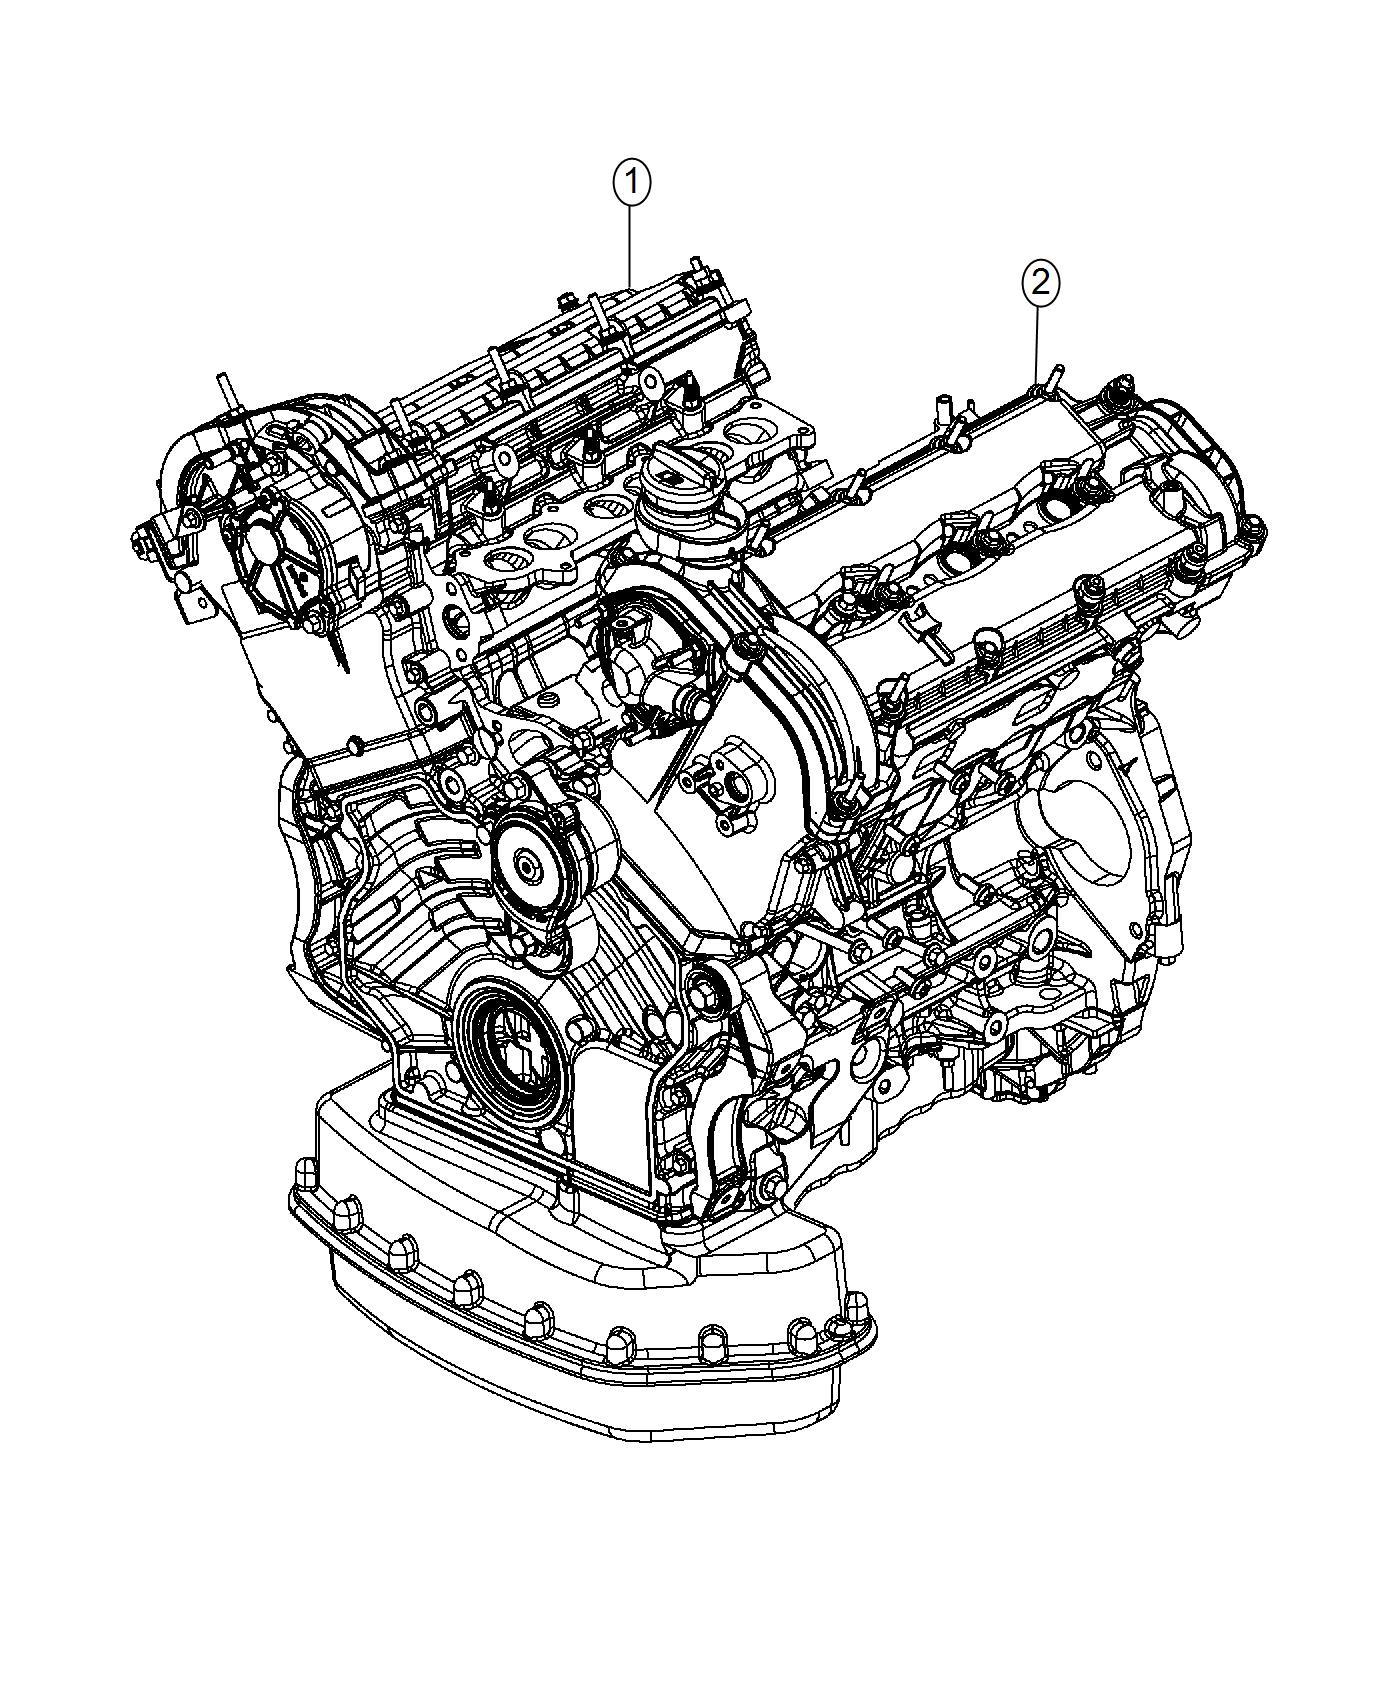 Jeep Grand Cherokee Engine Long Block Emission